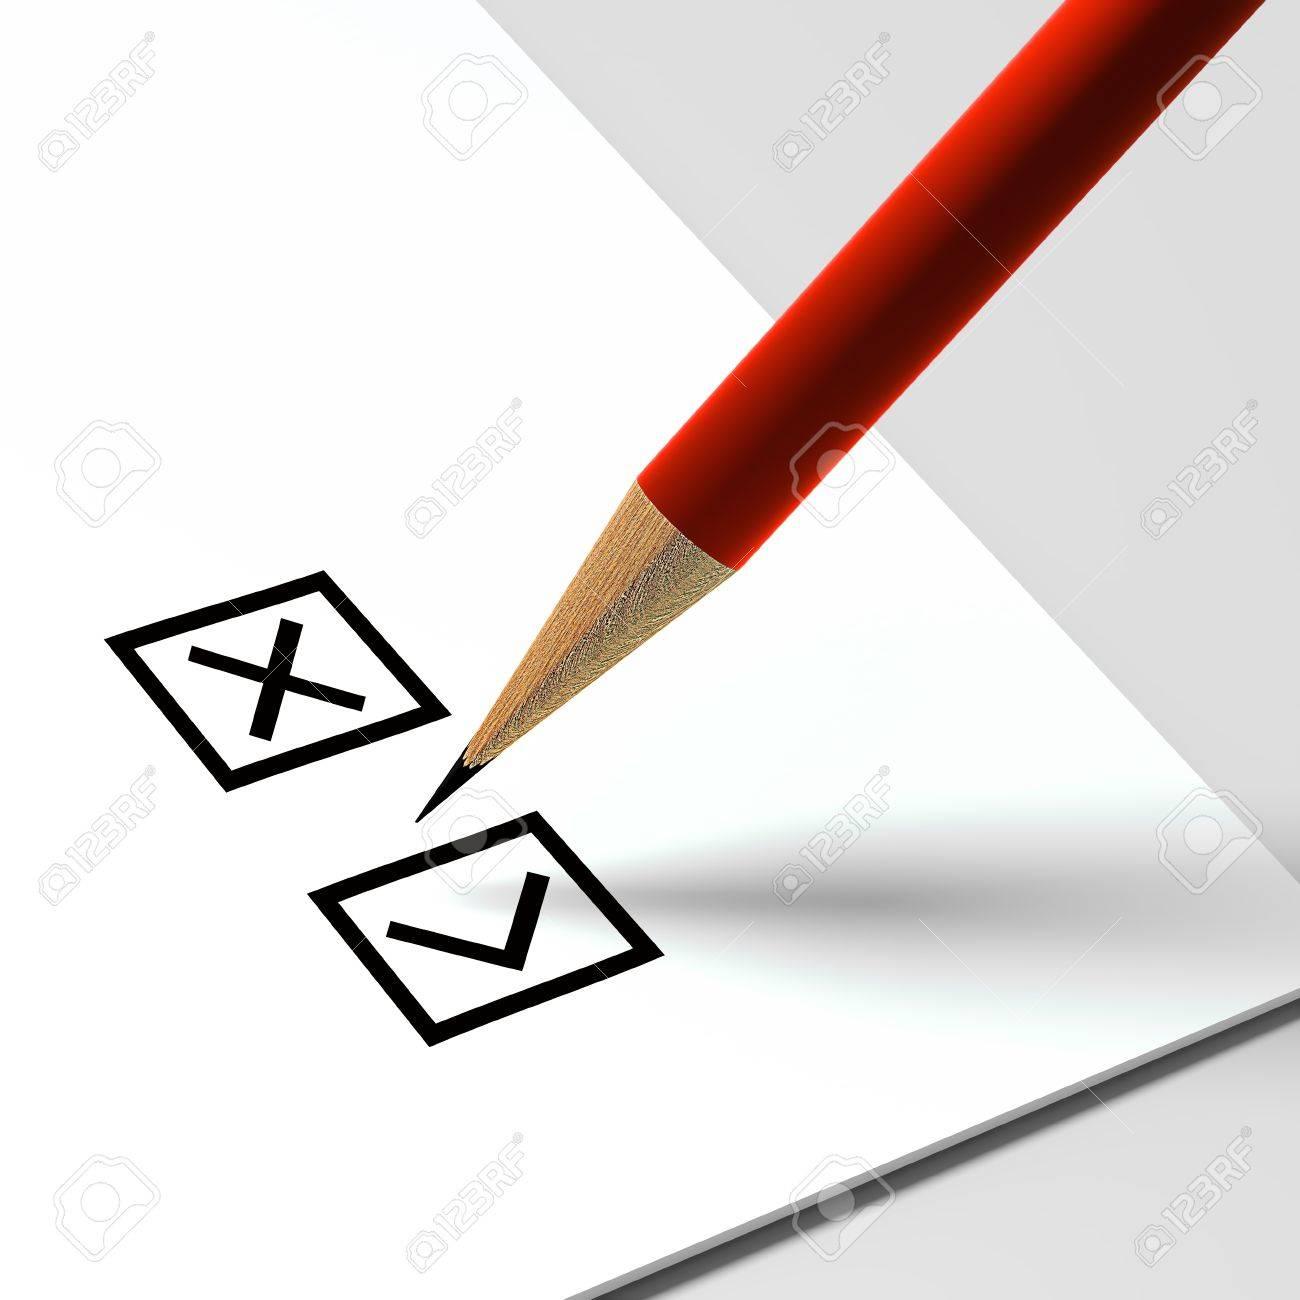 Dokument Papier Kugelschreiber Geschäft Vereinbarung Schreiben